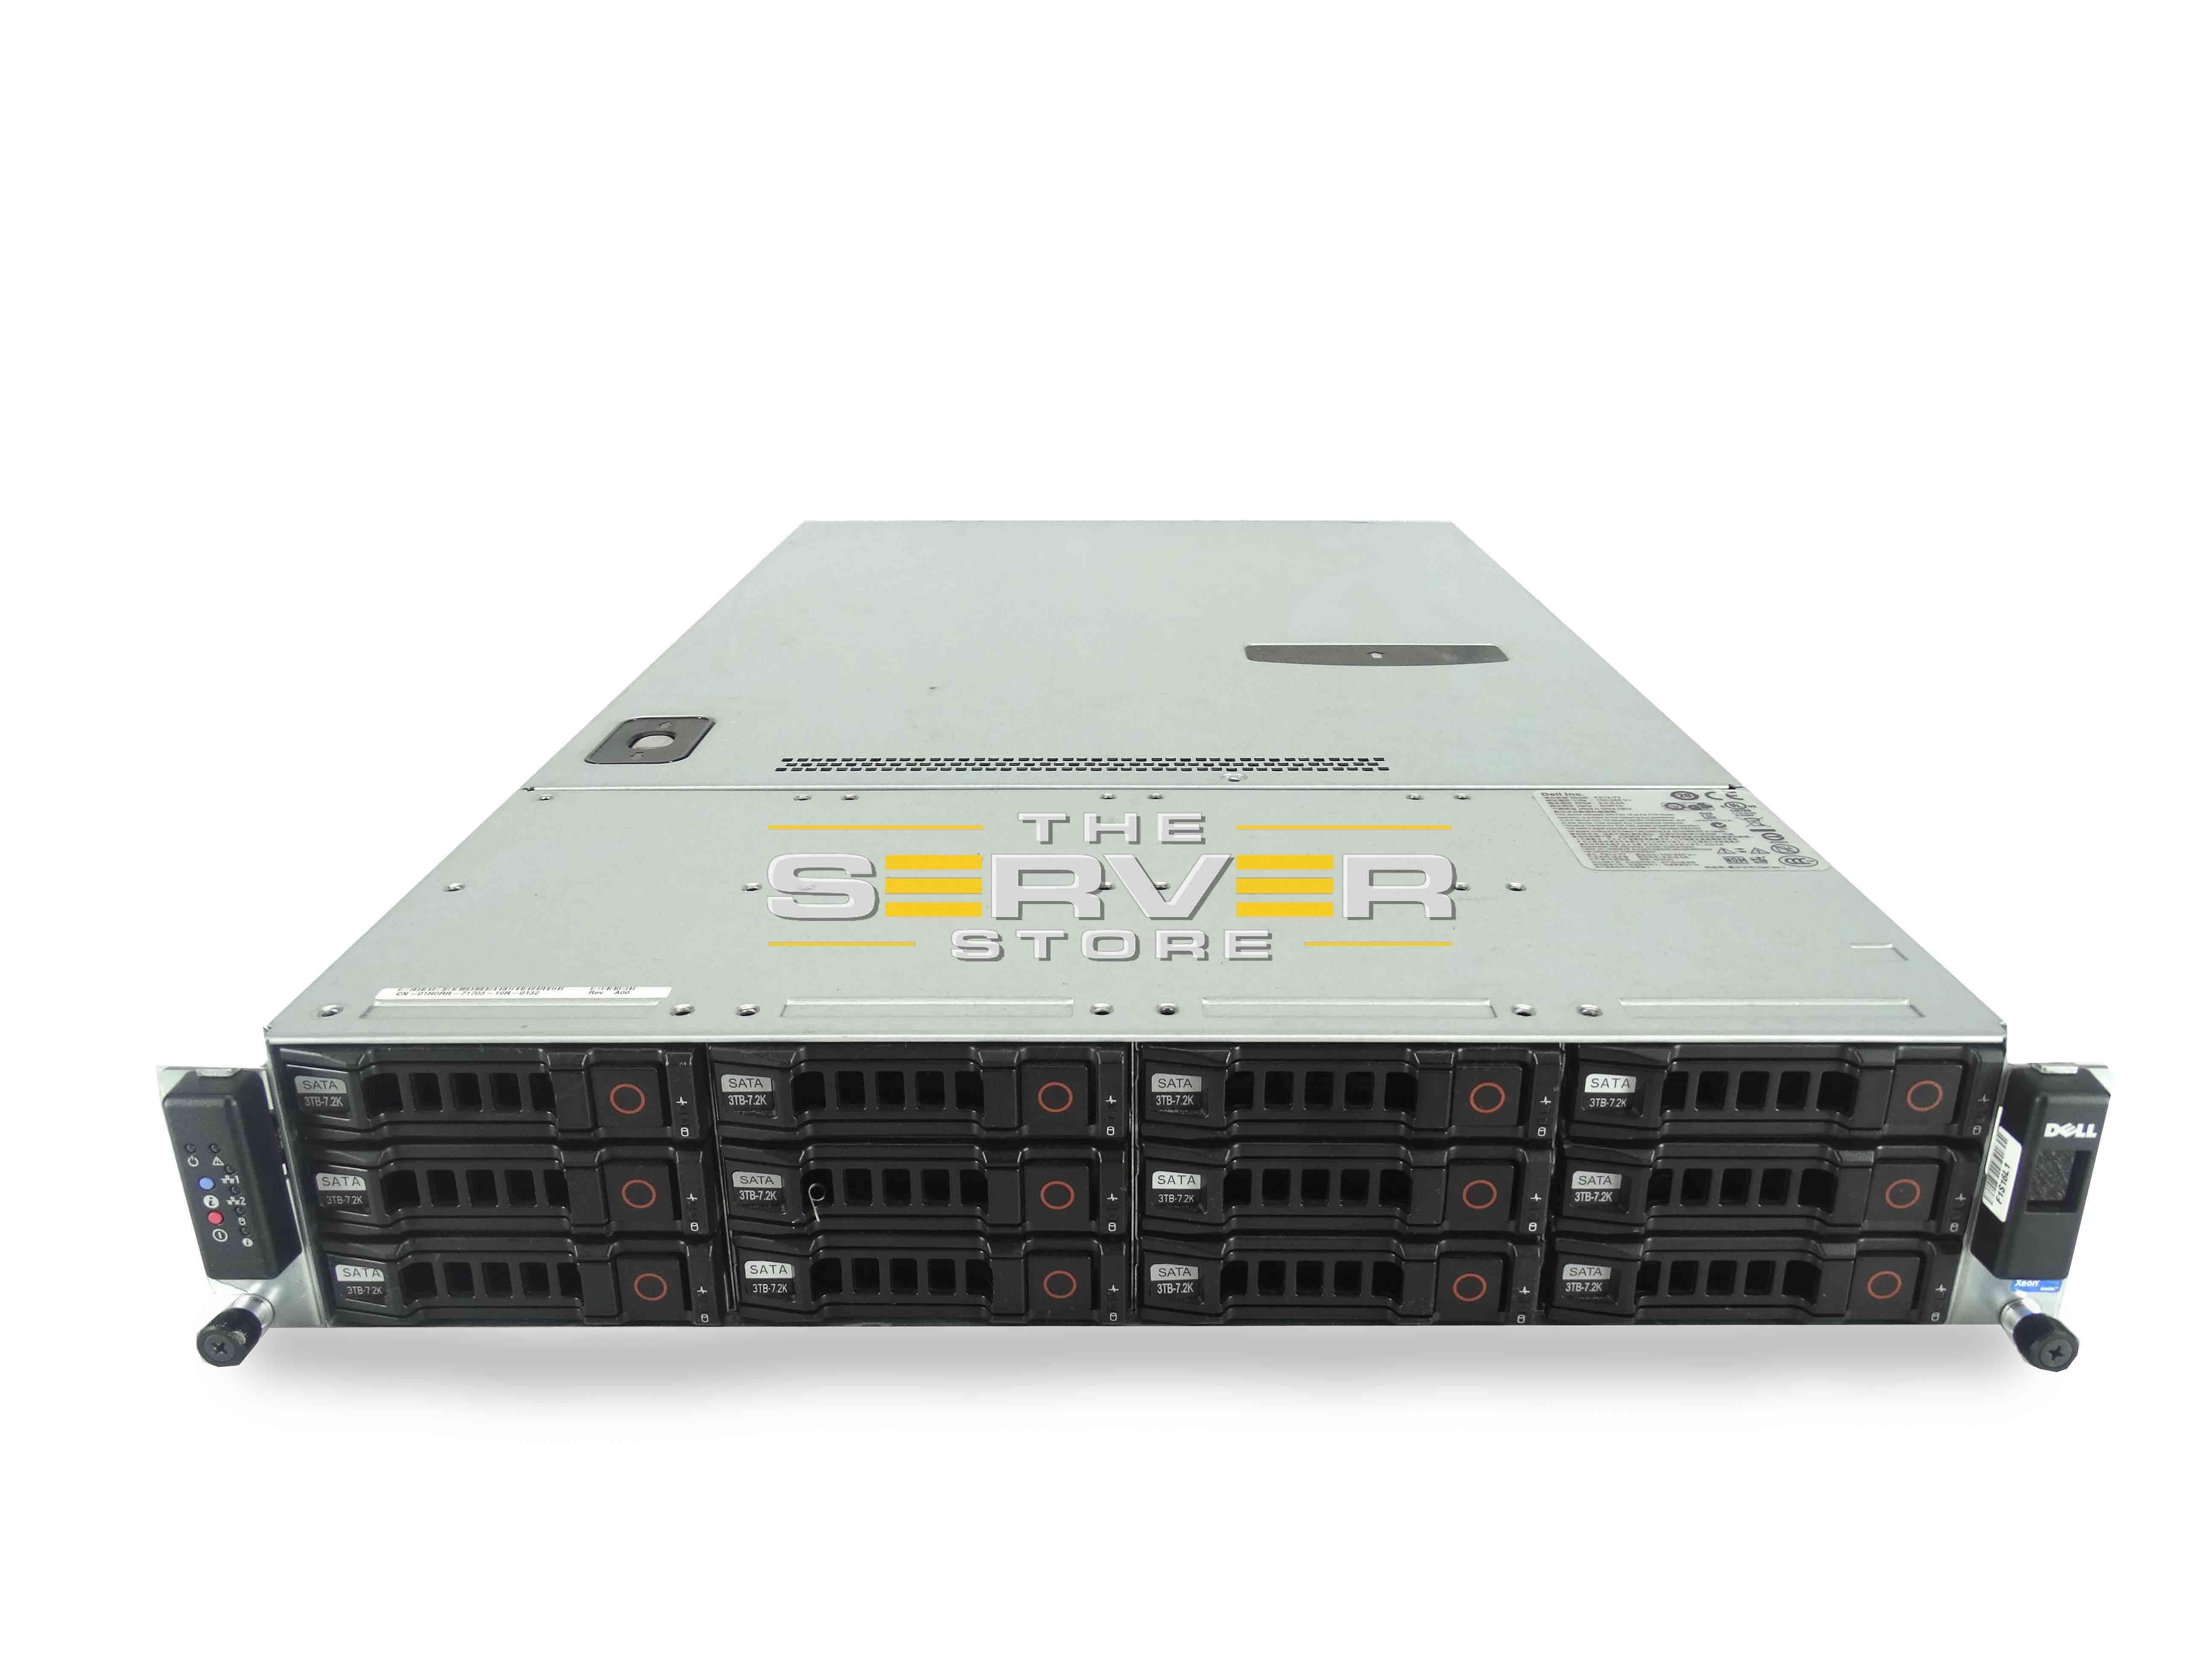 theserverstoreDell PowerEdge C2100 12x 2U LFF ServerDell PowerEdge C2100 12x 2U LFF Server